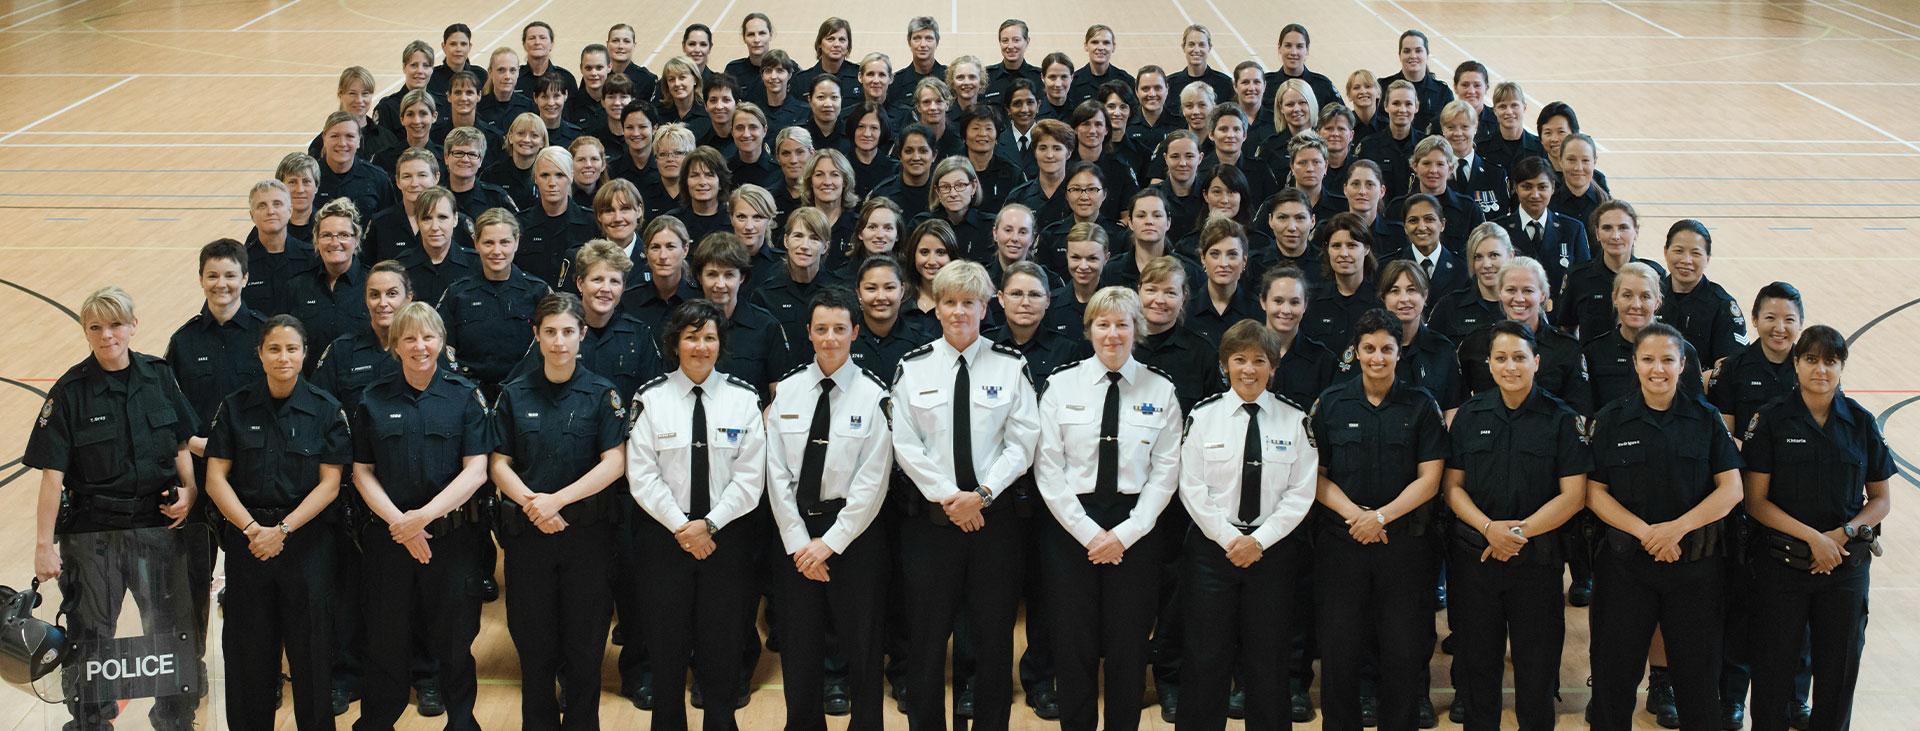 BCWLE BC Women In Law Enforcement Home Banner 092220